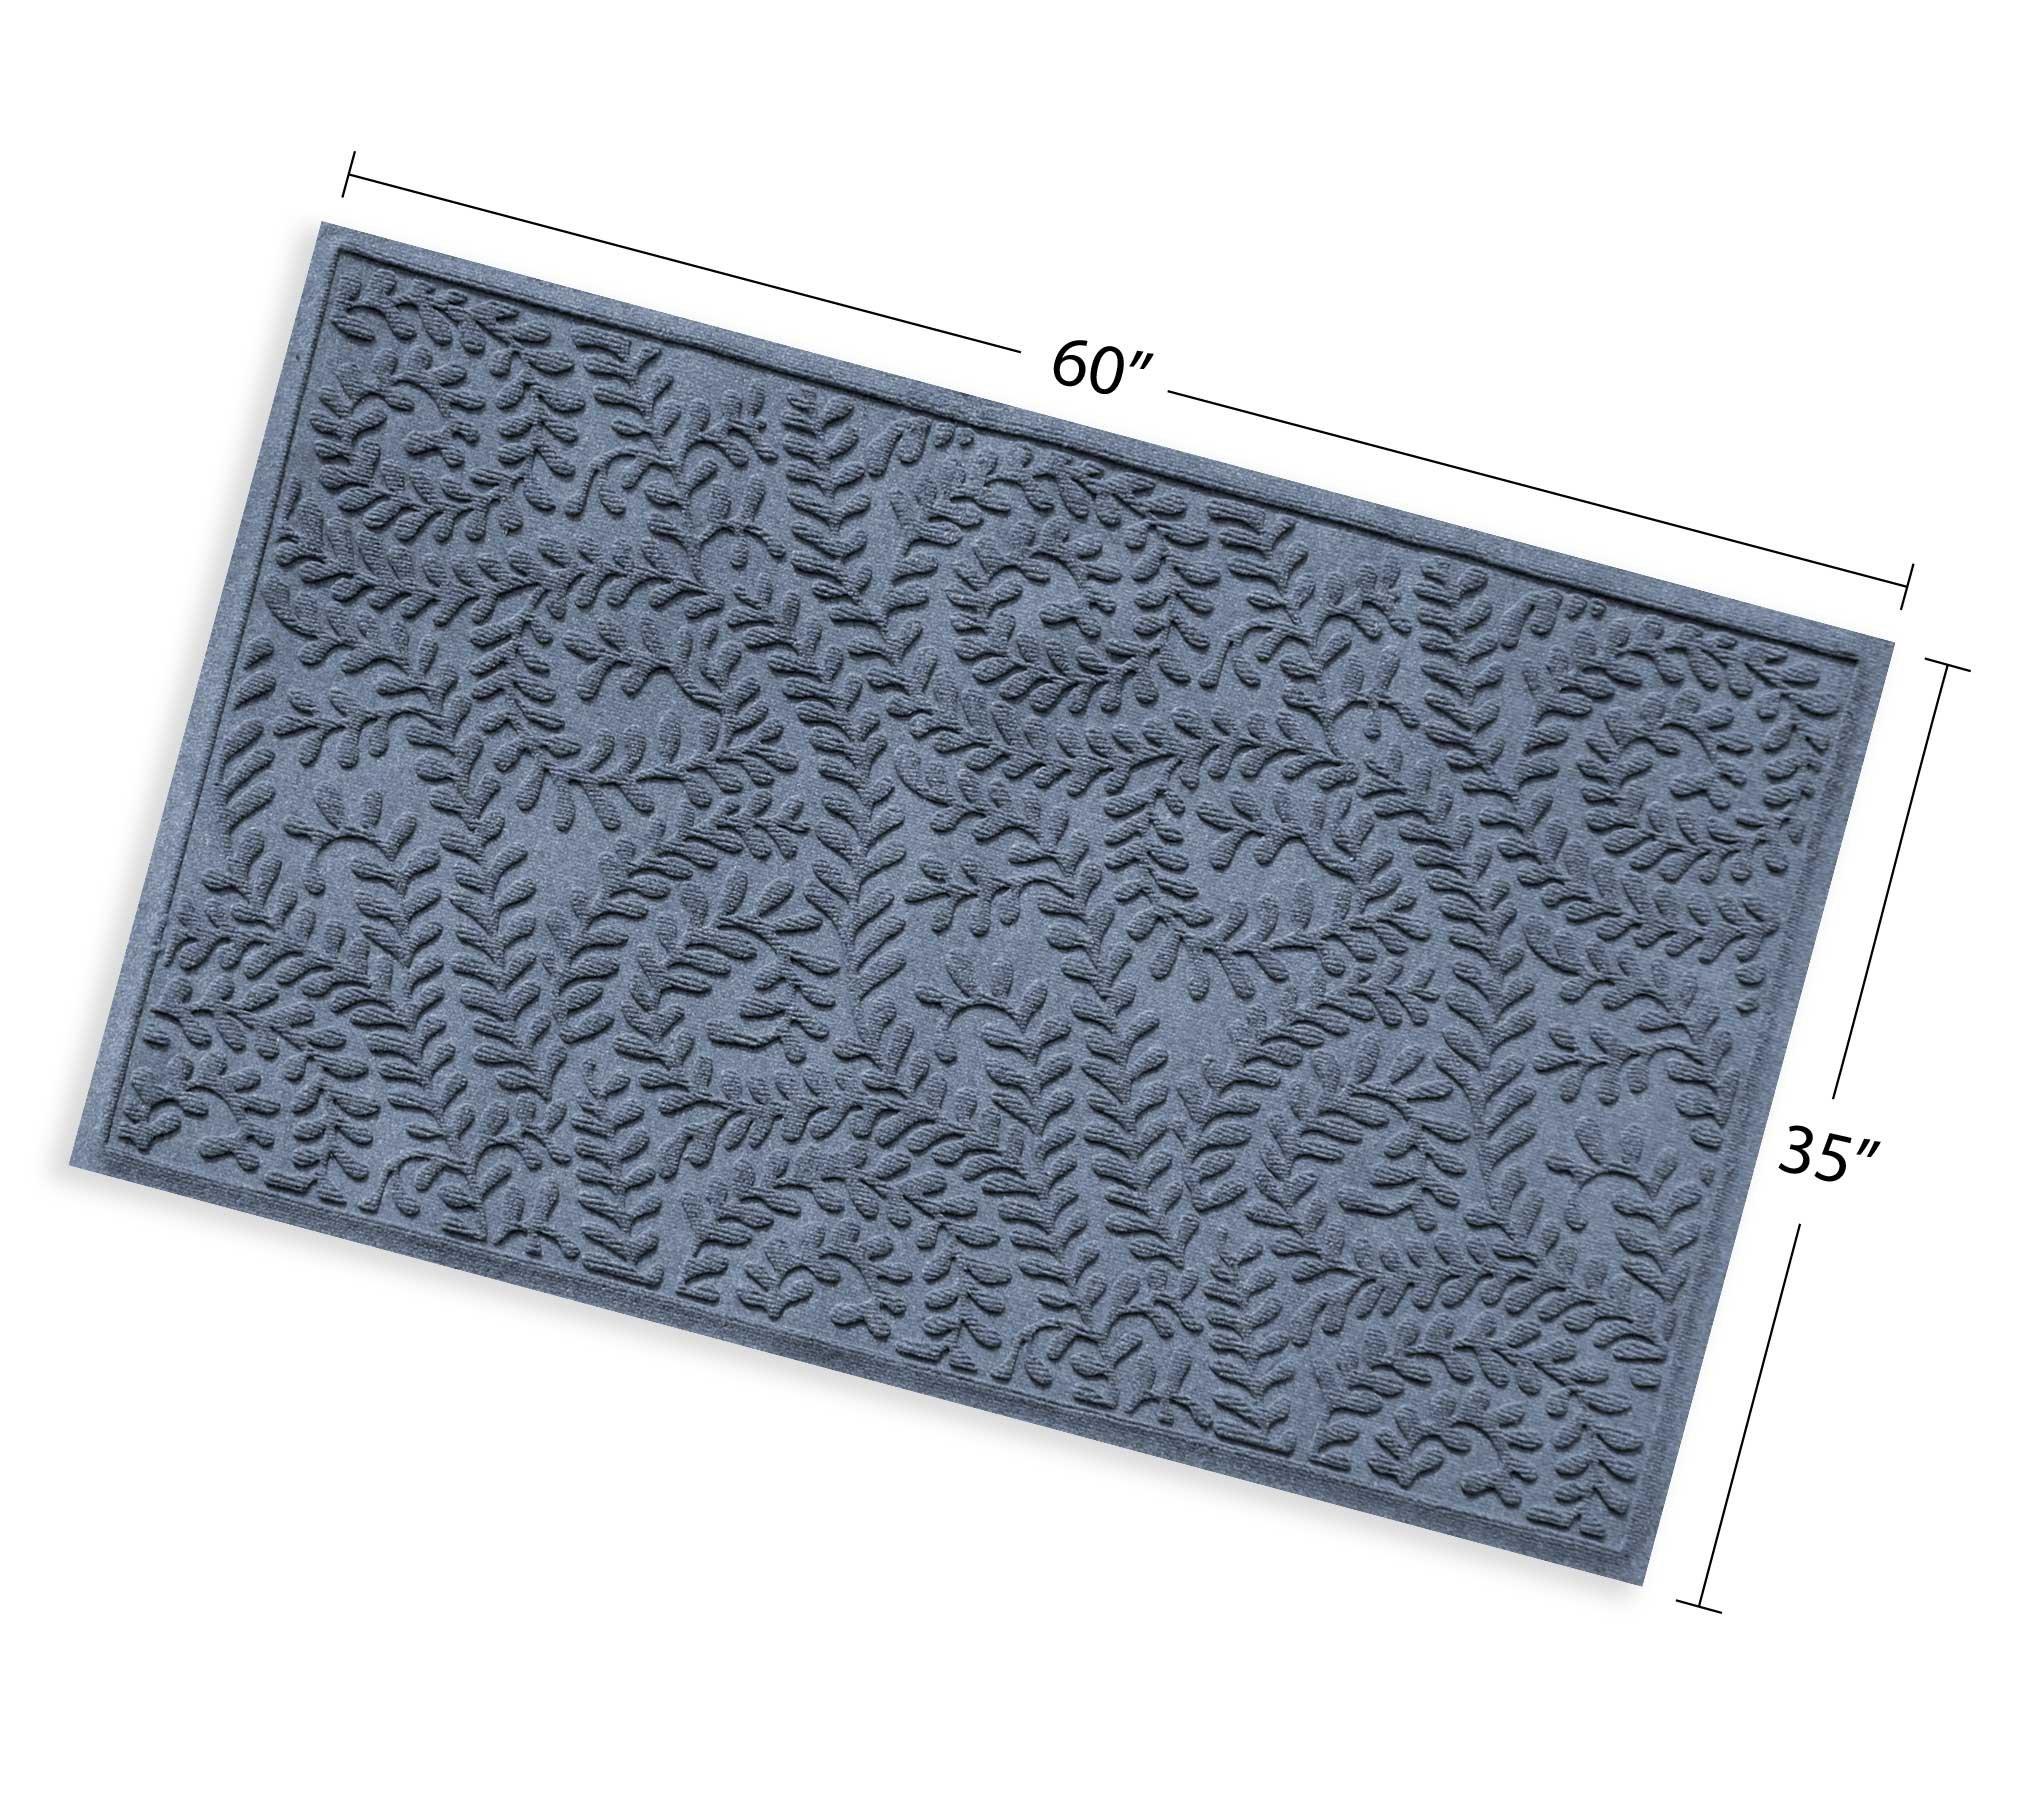 Bungalow Flooring Waterhog Indoor/Outdoor Doormat, 3' x 5', Skid Resistant, Easy to Clean, Catches Water and Debris, Boxwood Collection, Bluestone by Bungalow Flooring (Image #5)